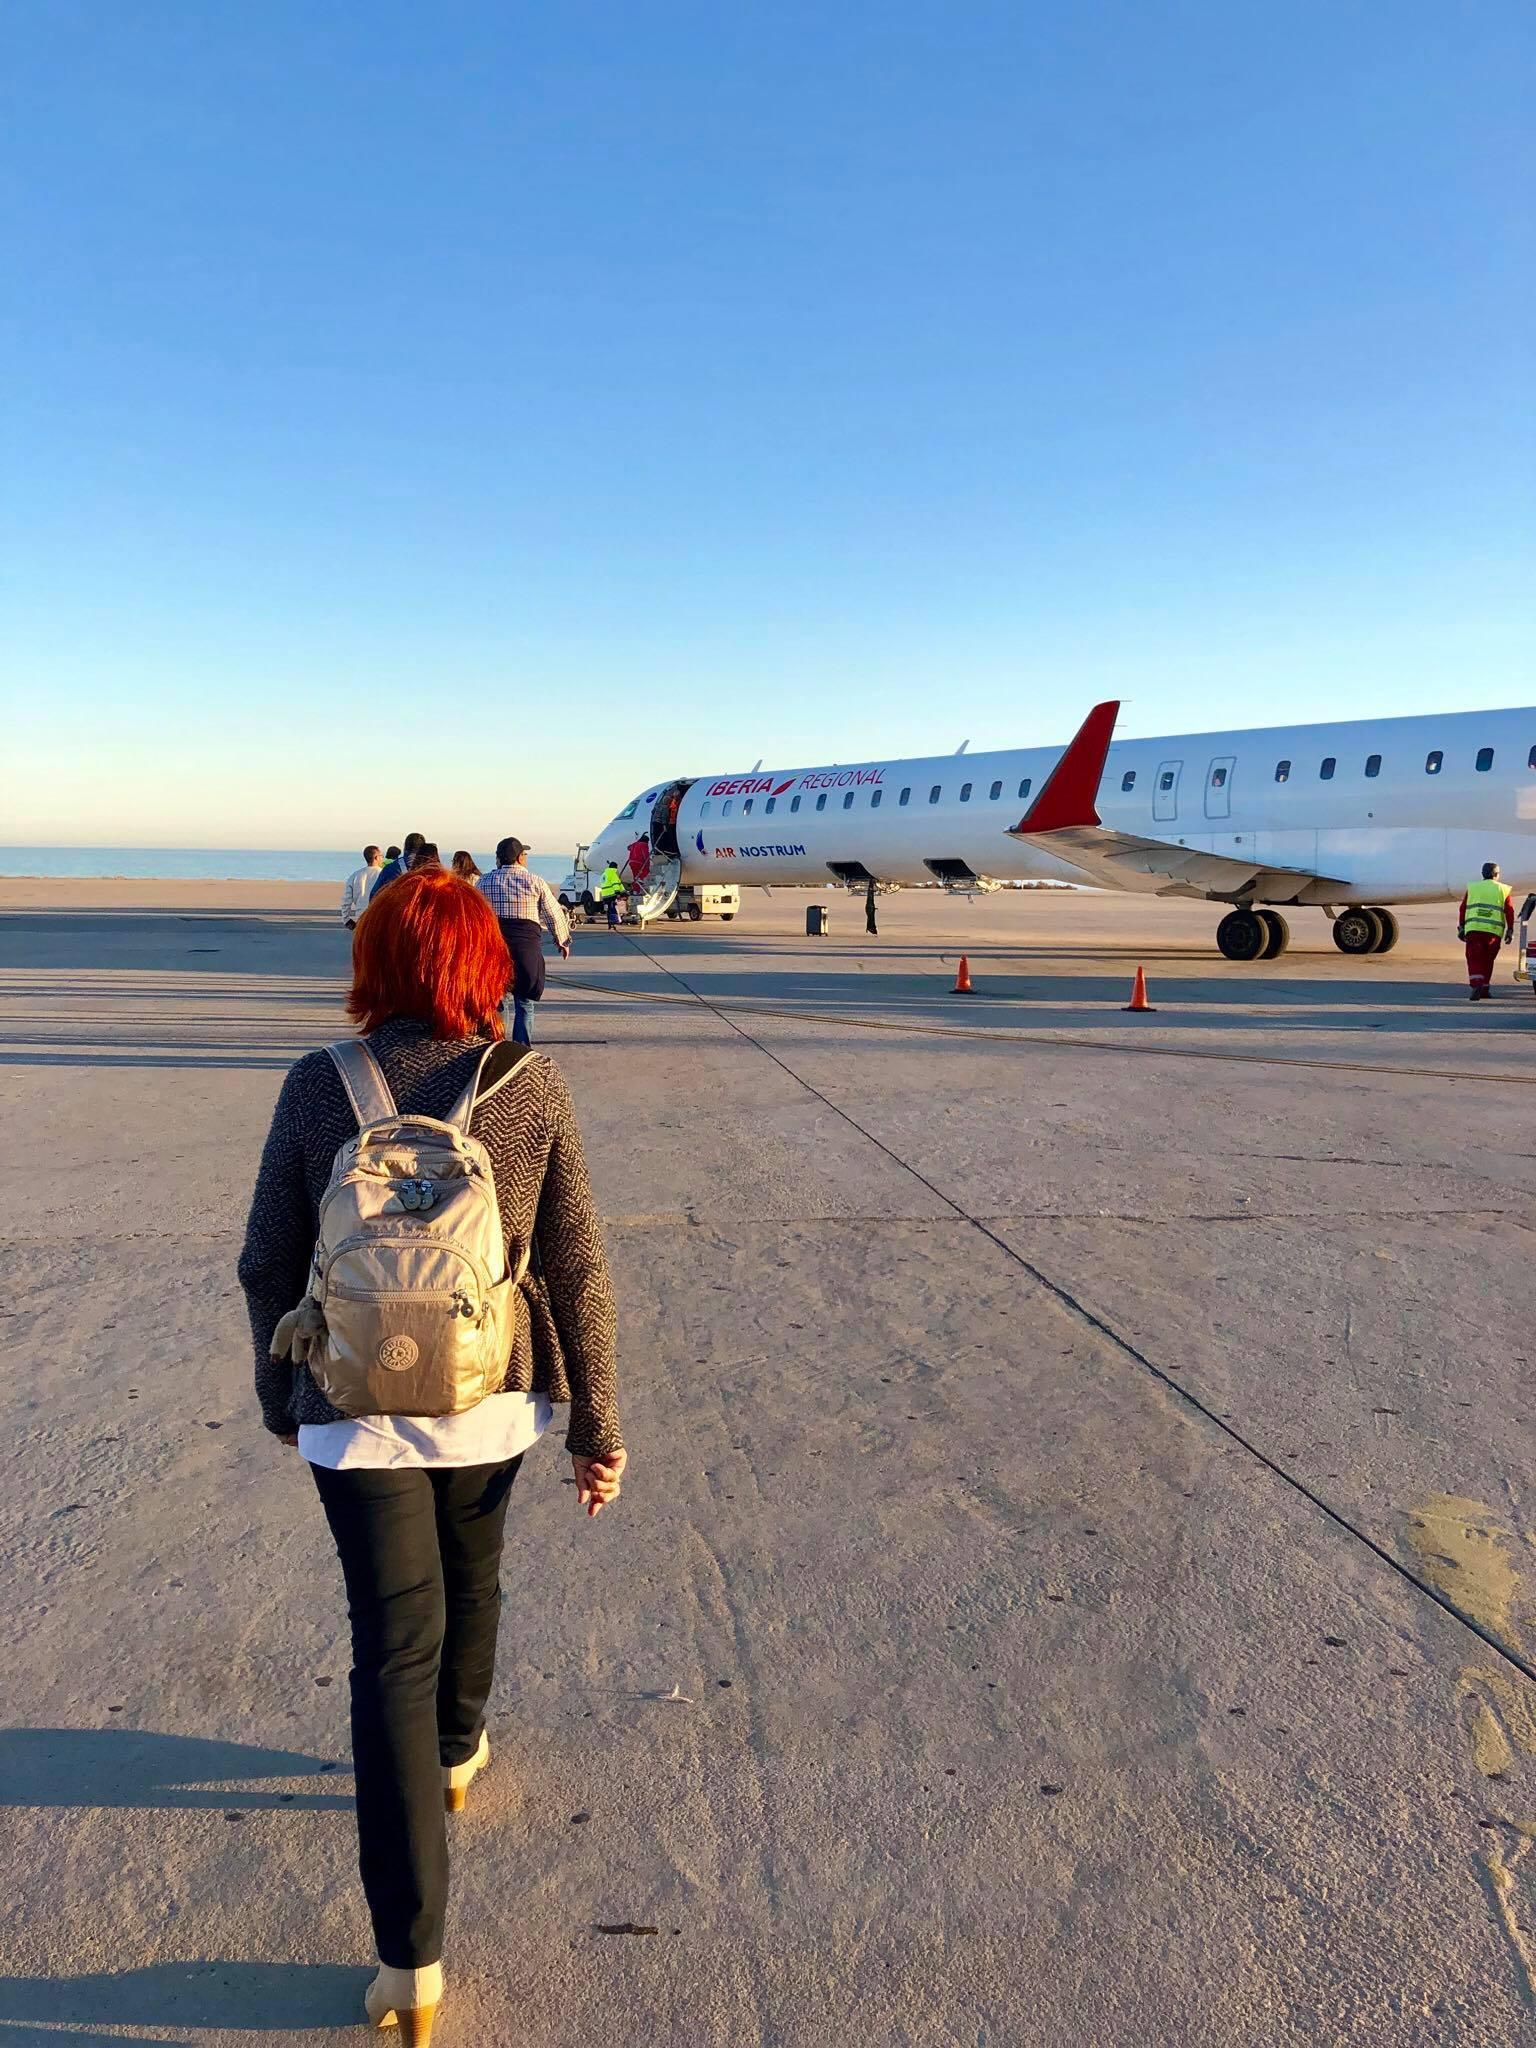 Kach Solo Travels in 2019 Thanks to Cámara de Comercio de Almería9.jpg